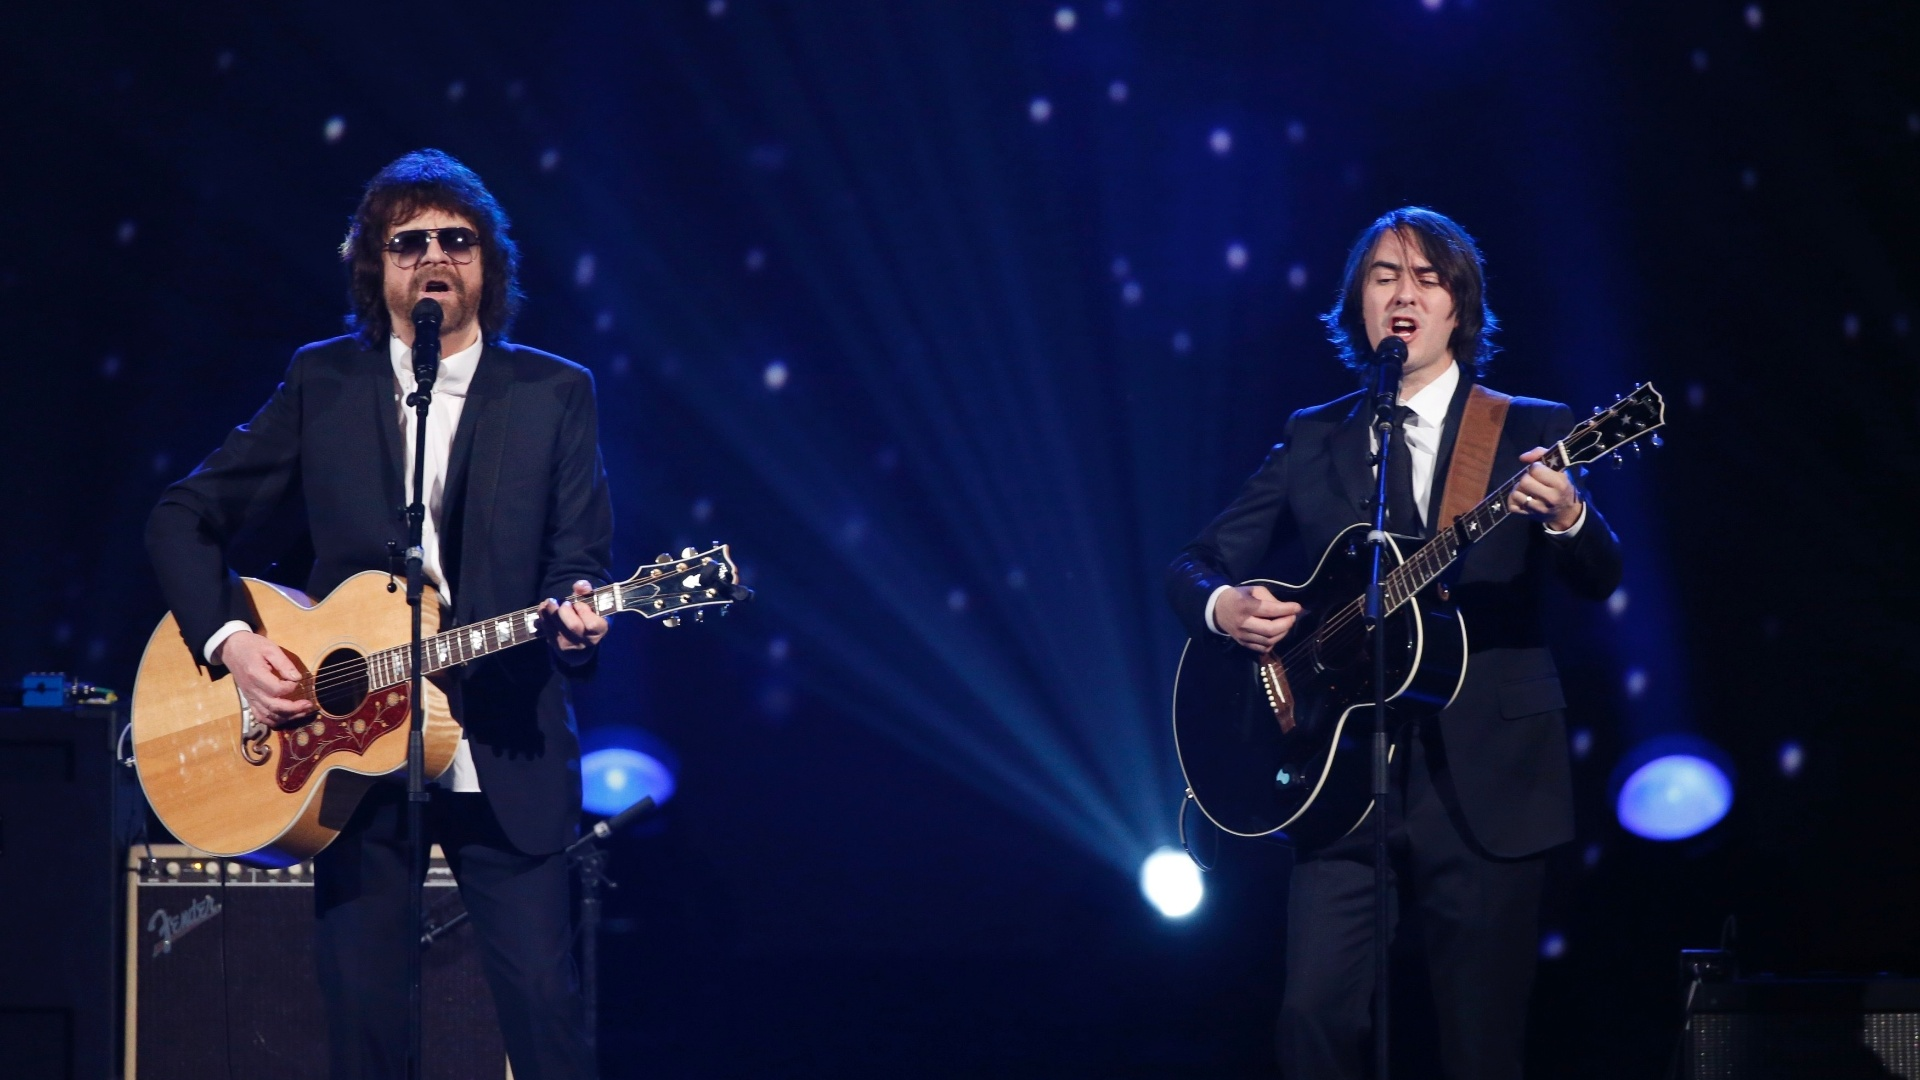 27.jan.2014 - Jeff Lynne e Dhani Harrison, filho de George Harrison, participam da gravação do especial